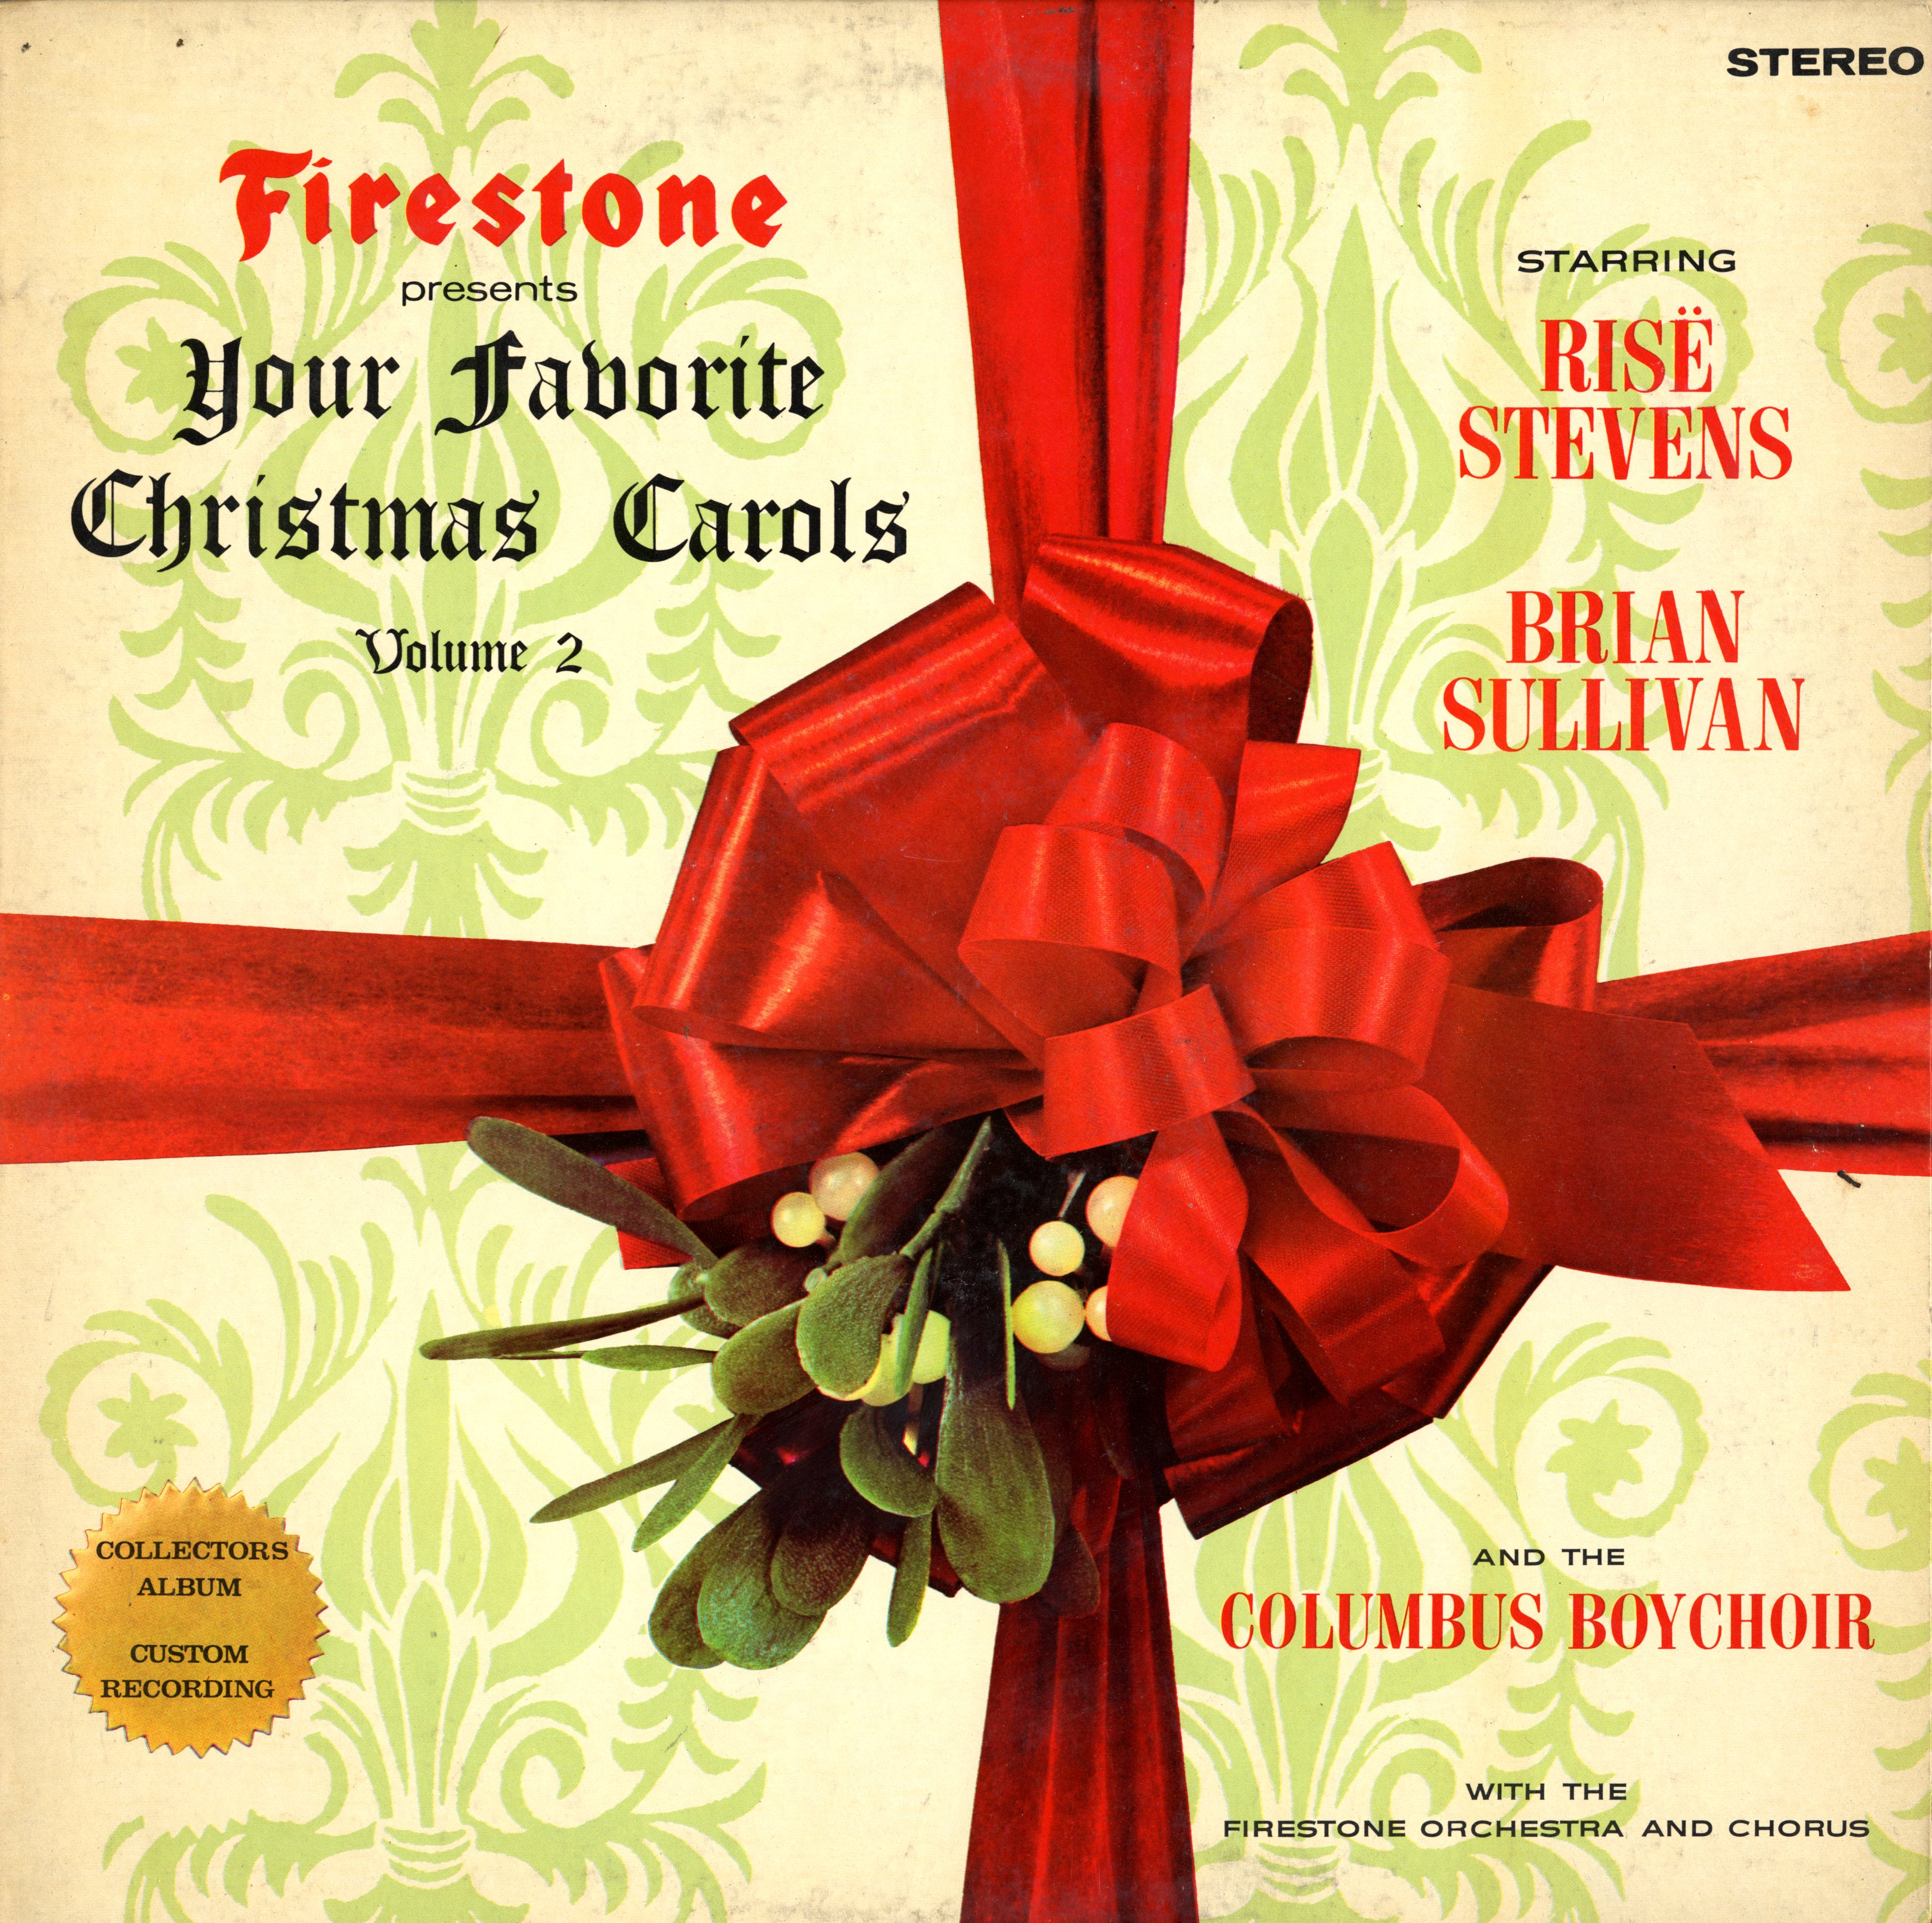 Lighted 8 Song Musical Holiday Christmas Carolers Choir: Firestone Your Favorite Christmas Music & Carol Carols